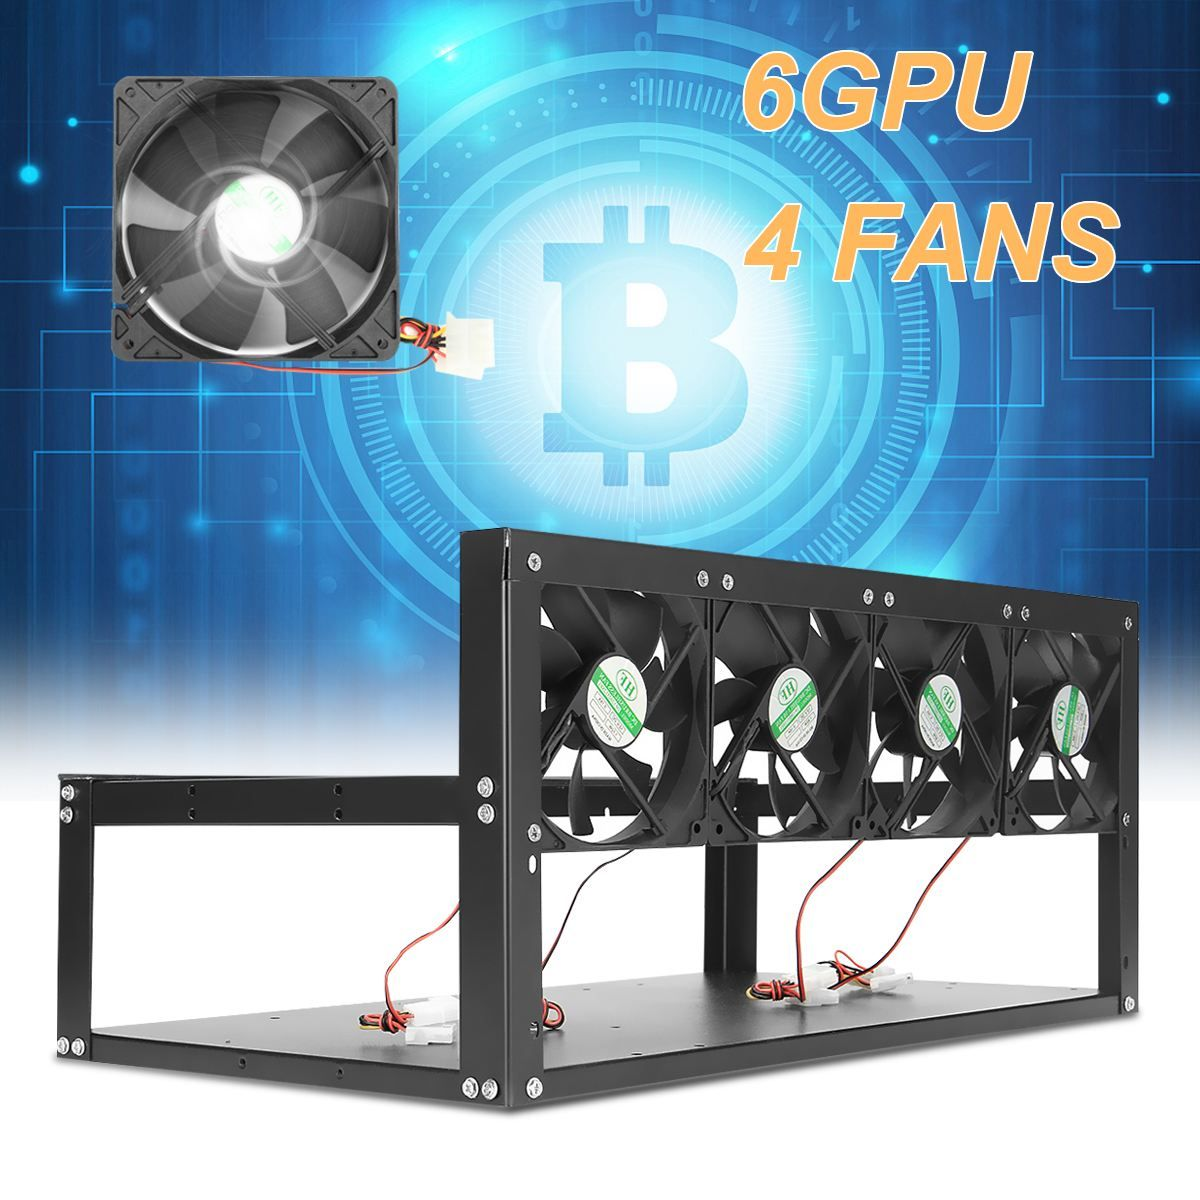 6 GPU 4 Fans Open Air Pro <font><b>Mining</b></font> Computer Alloy Case Frame Rig 4 for 6 GPU ETH BTC ZEC Ethereum